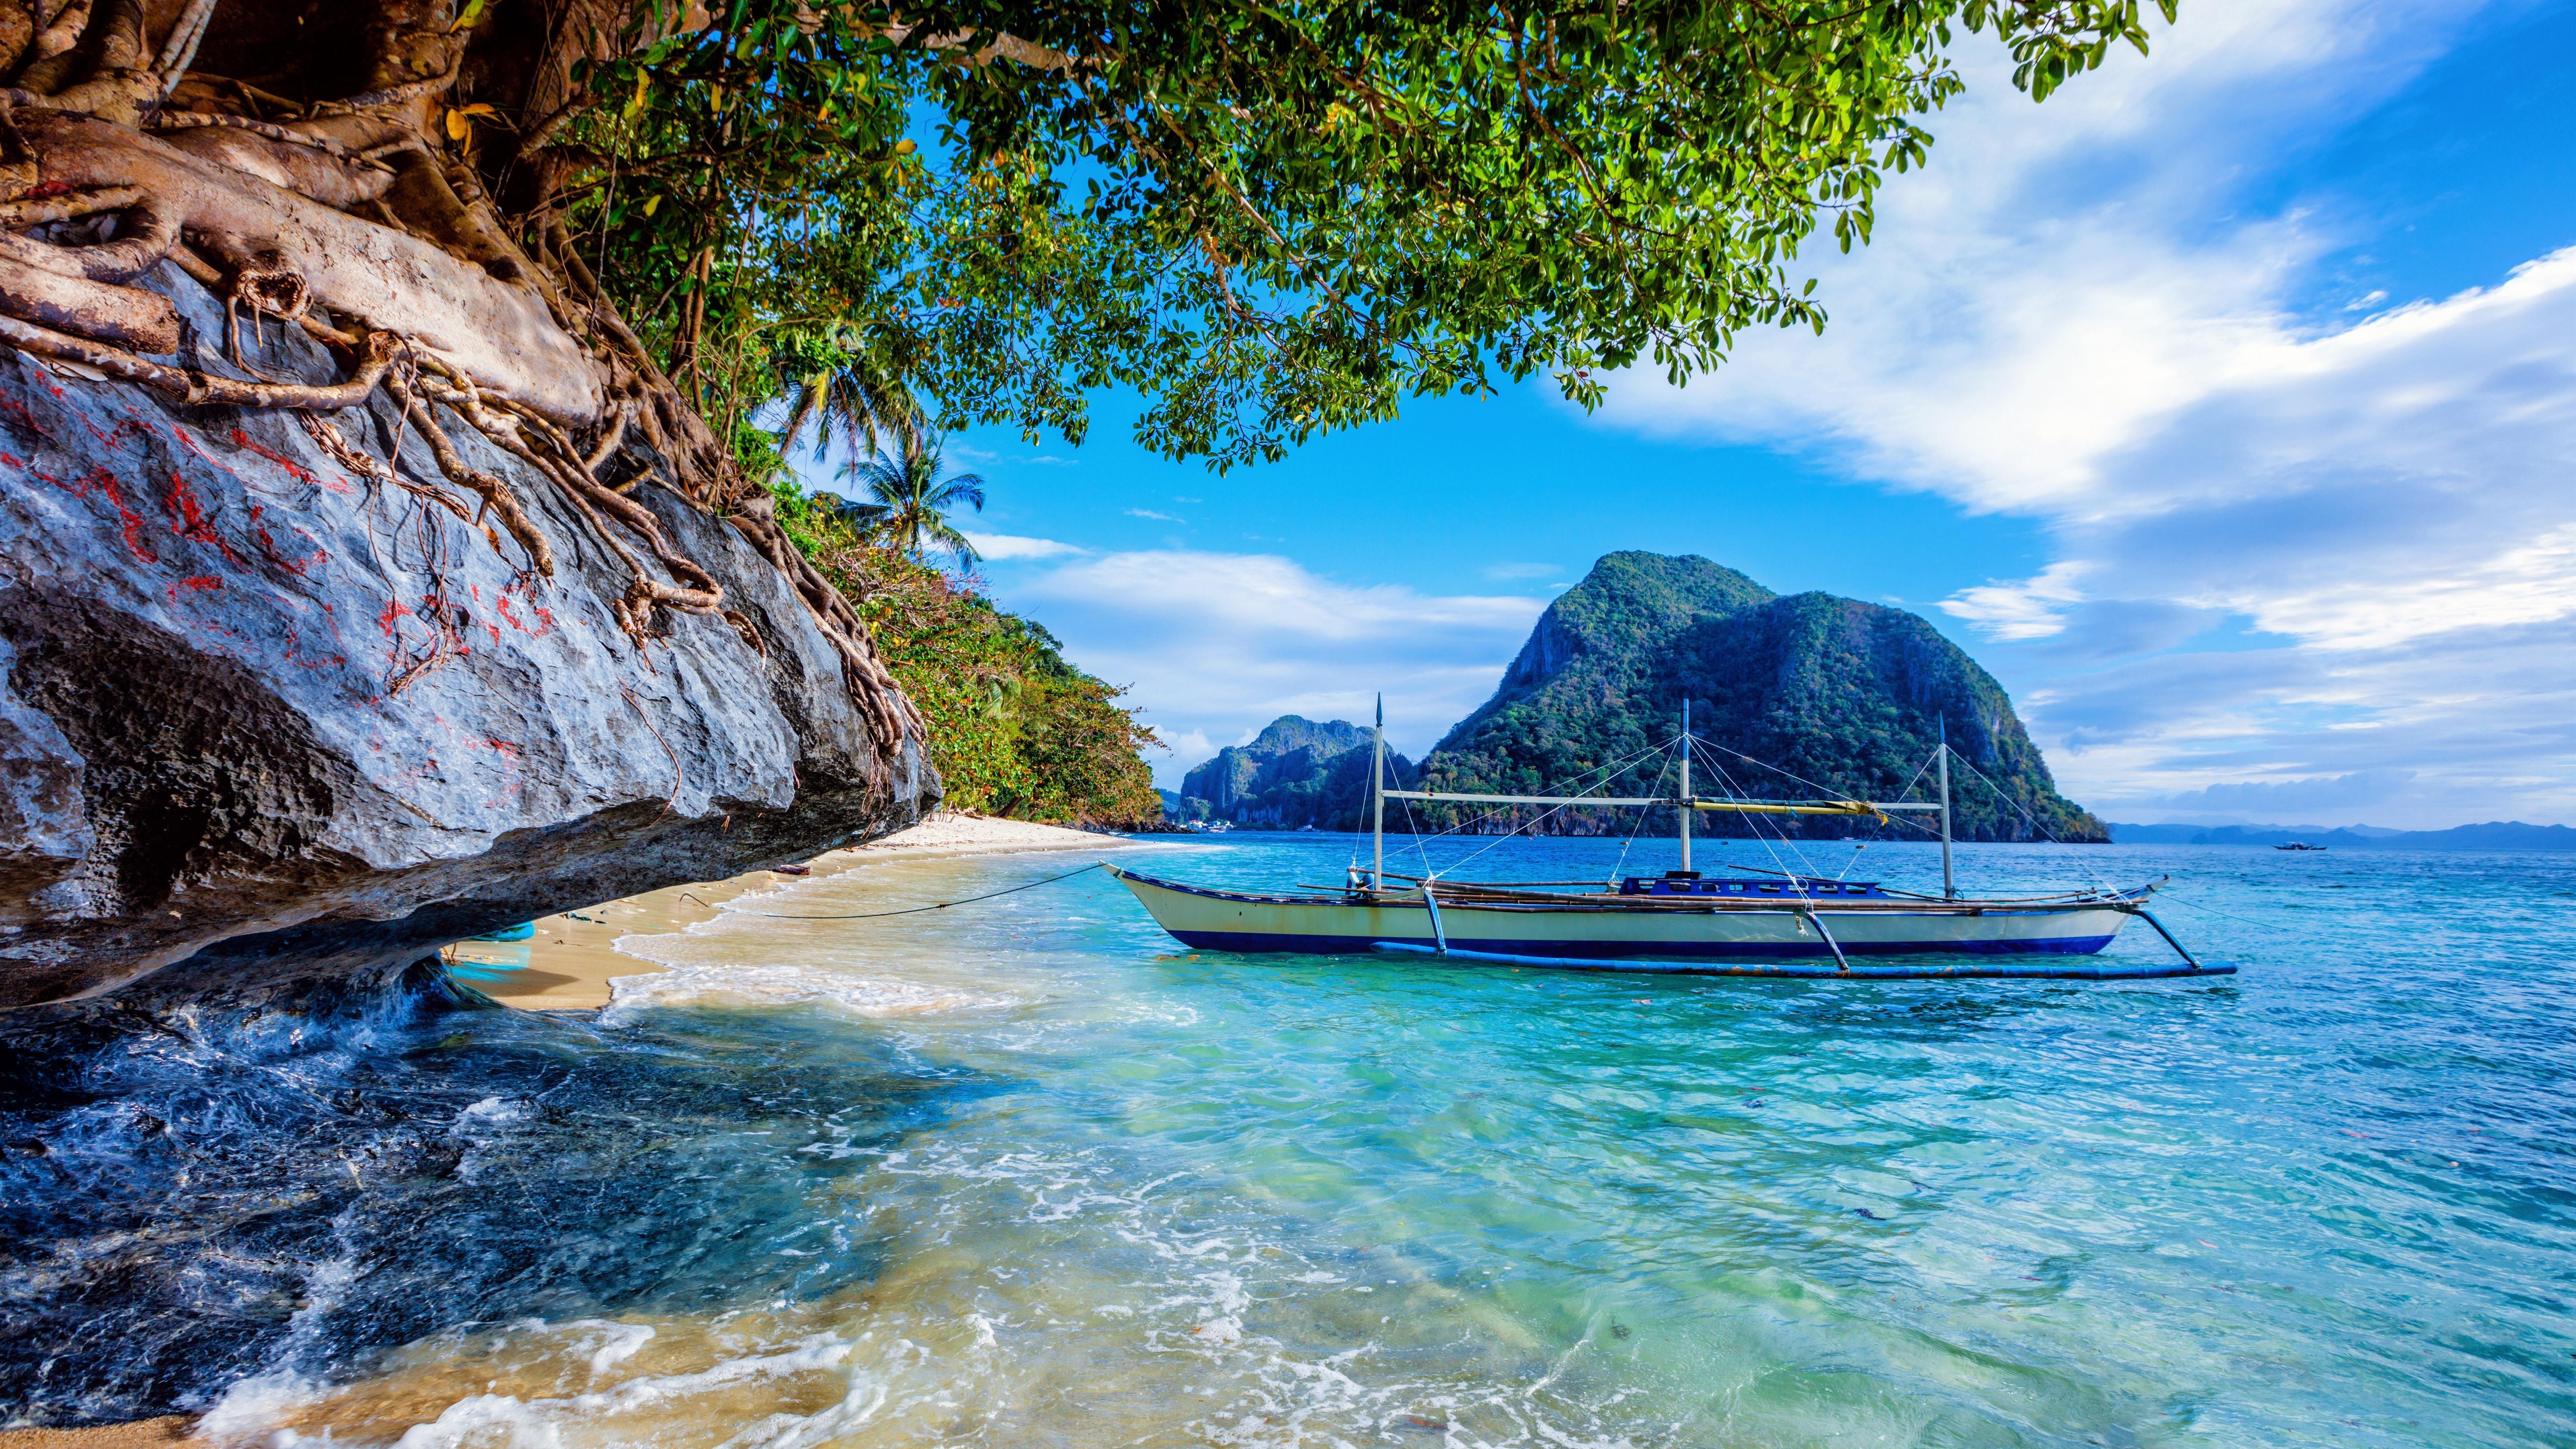 Wallpaper Philippines Beach Sea Boat Trees 5120x2880 Uhd